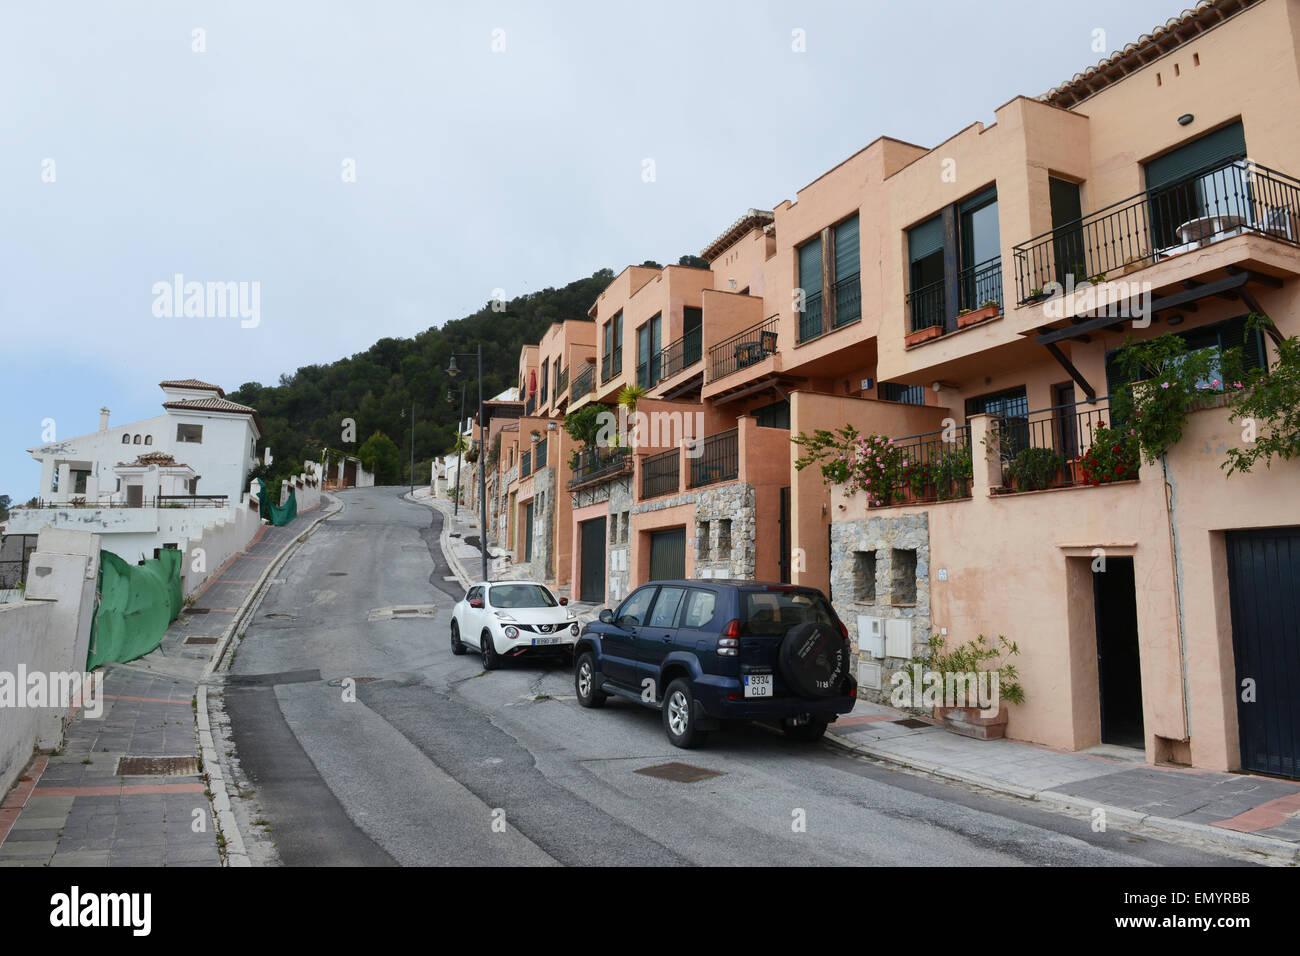 Property apartments subsidence on The ÔCarmenes del MarÕ urbanisation in Herradura, Costa Tropical, Spain. - Stock Image